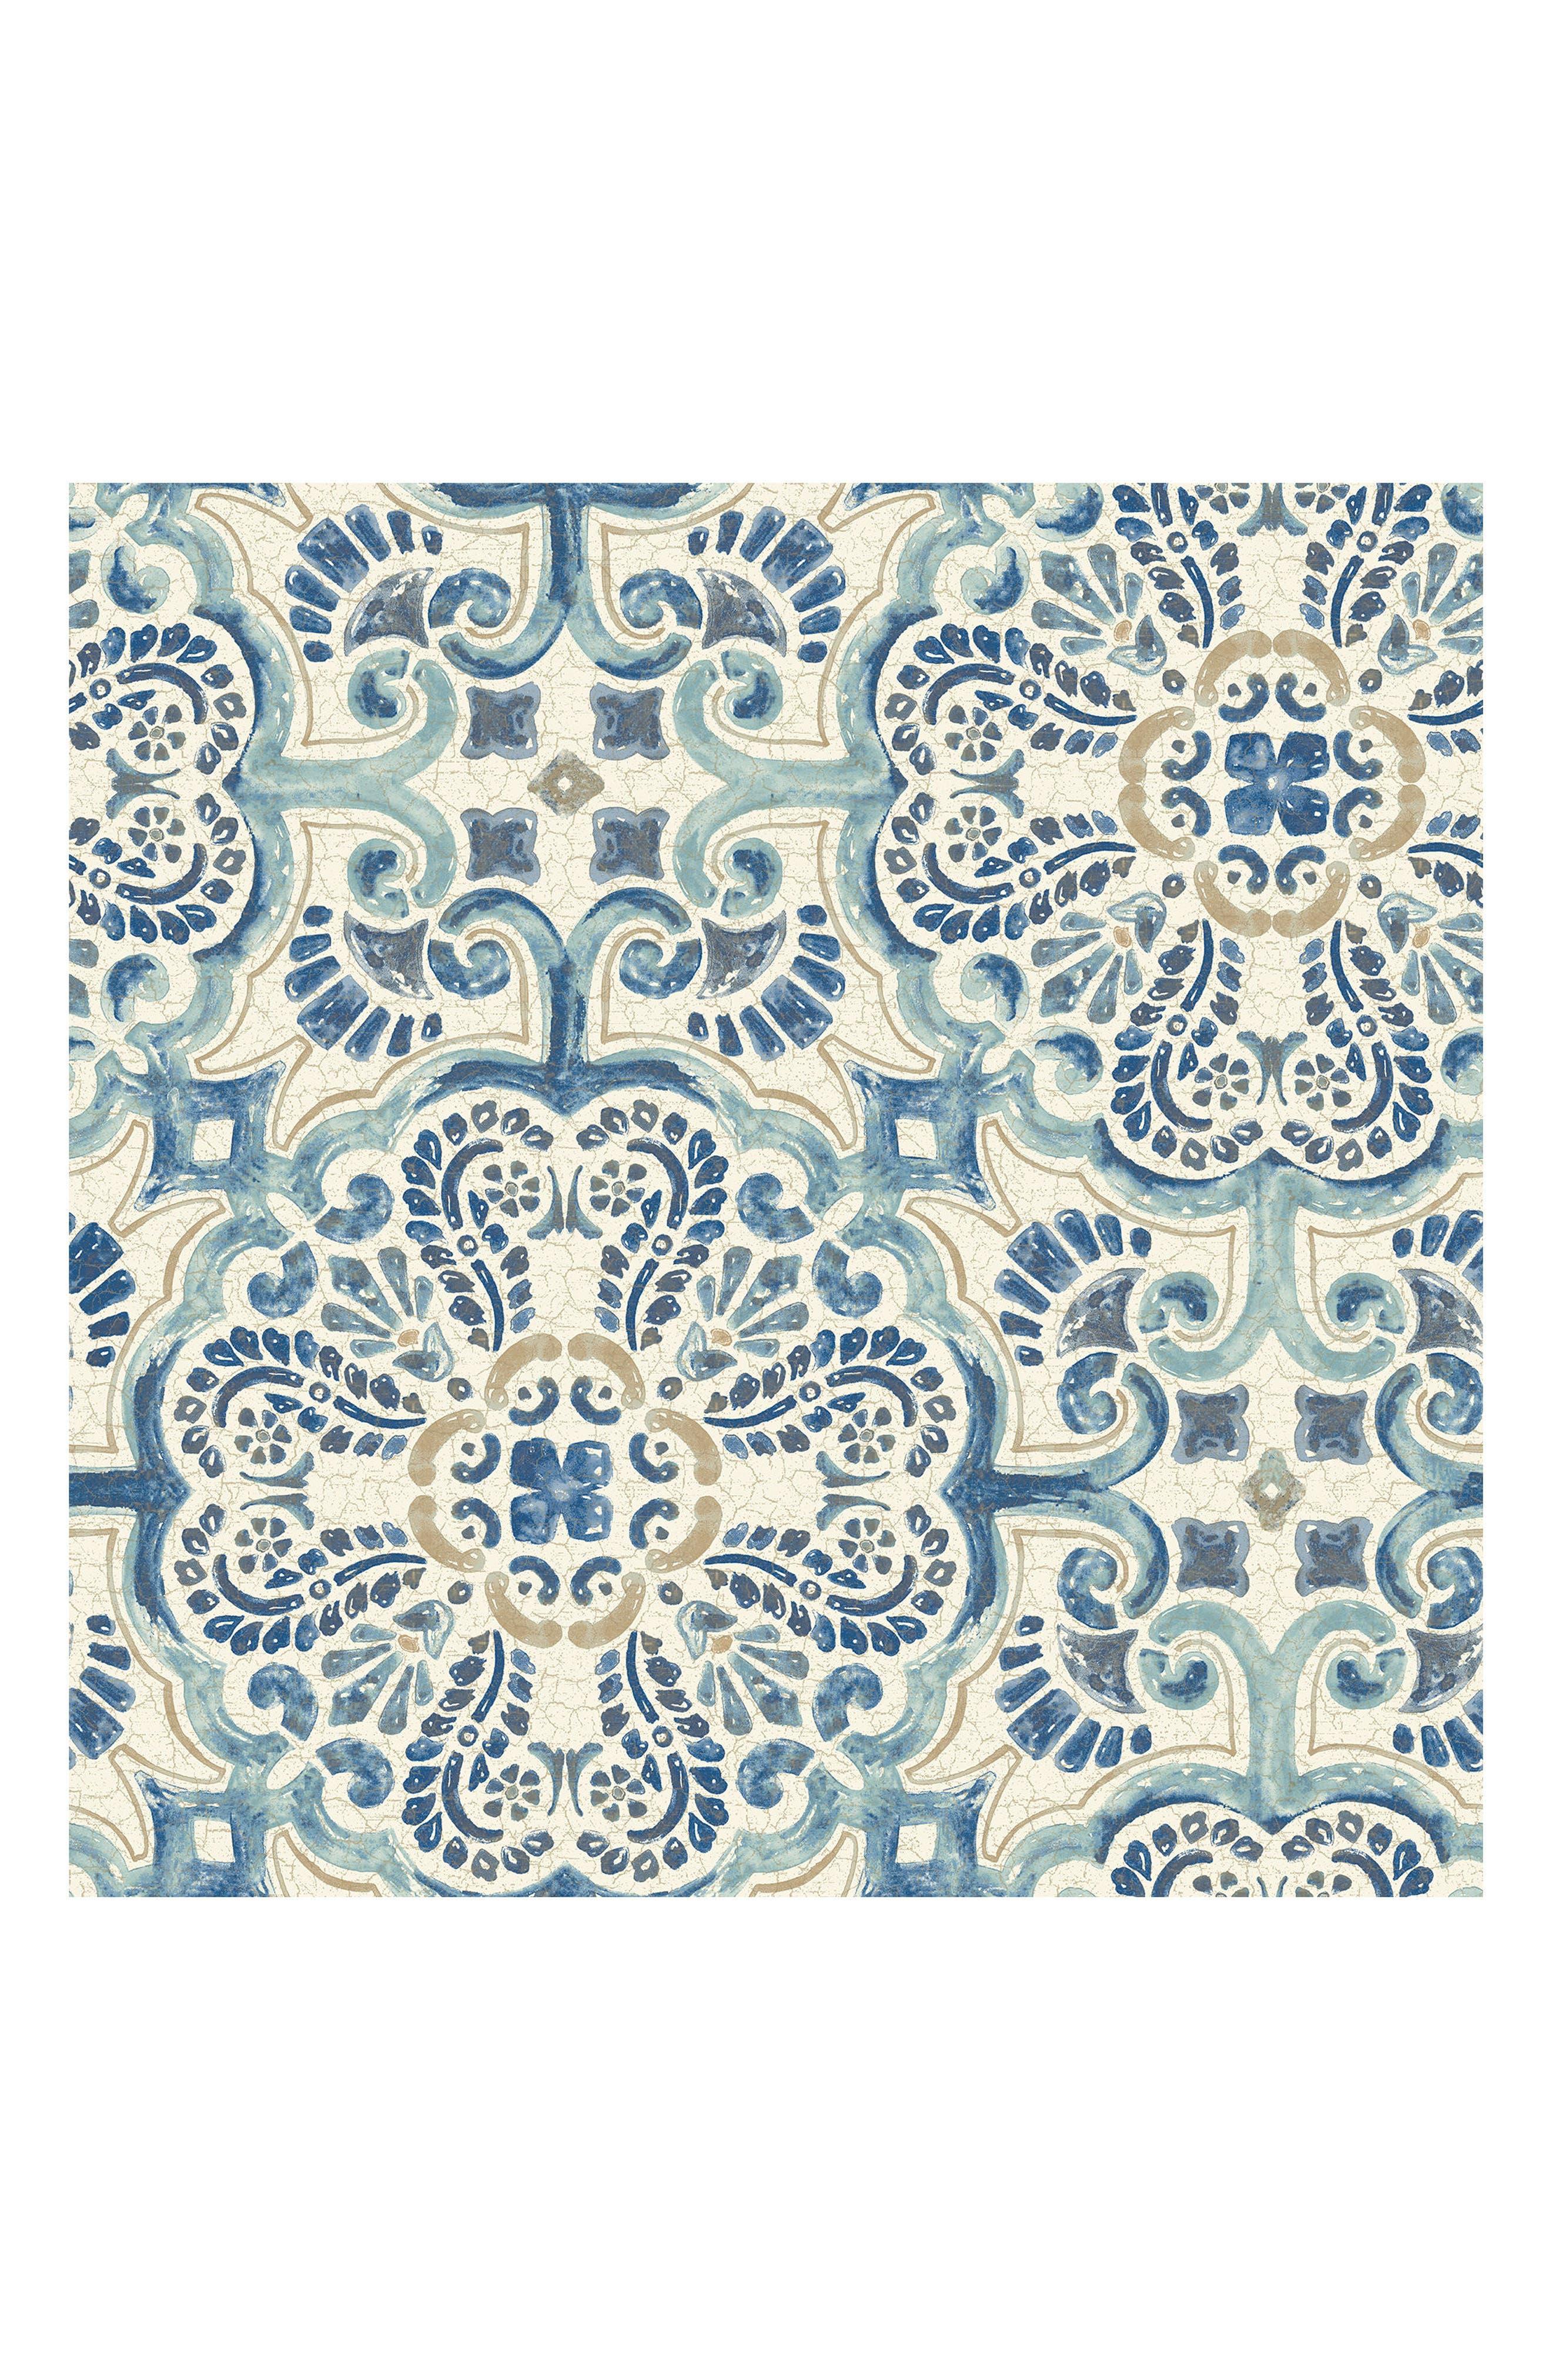 Alternate Image 1 Selected - Wallpops Blue Florentine Tile Peel & Stick Vinyl Wallpaper